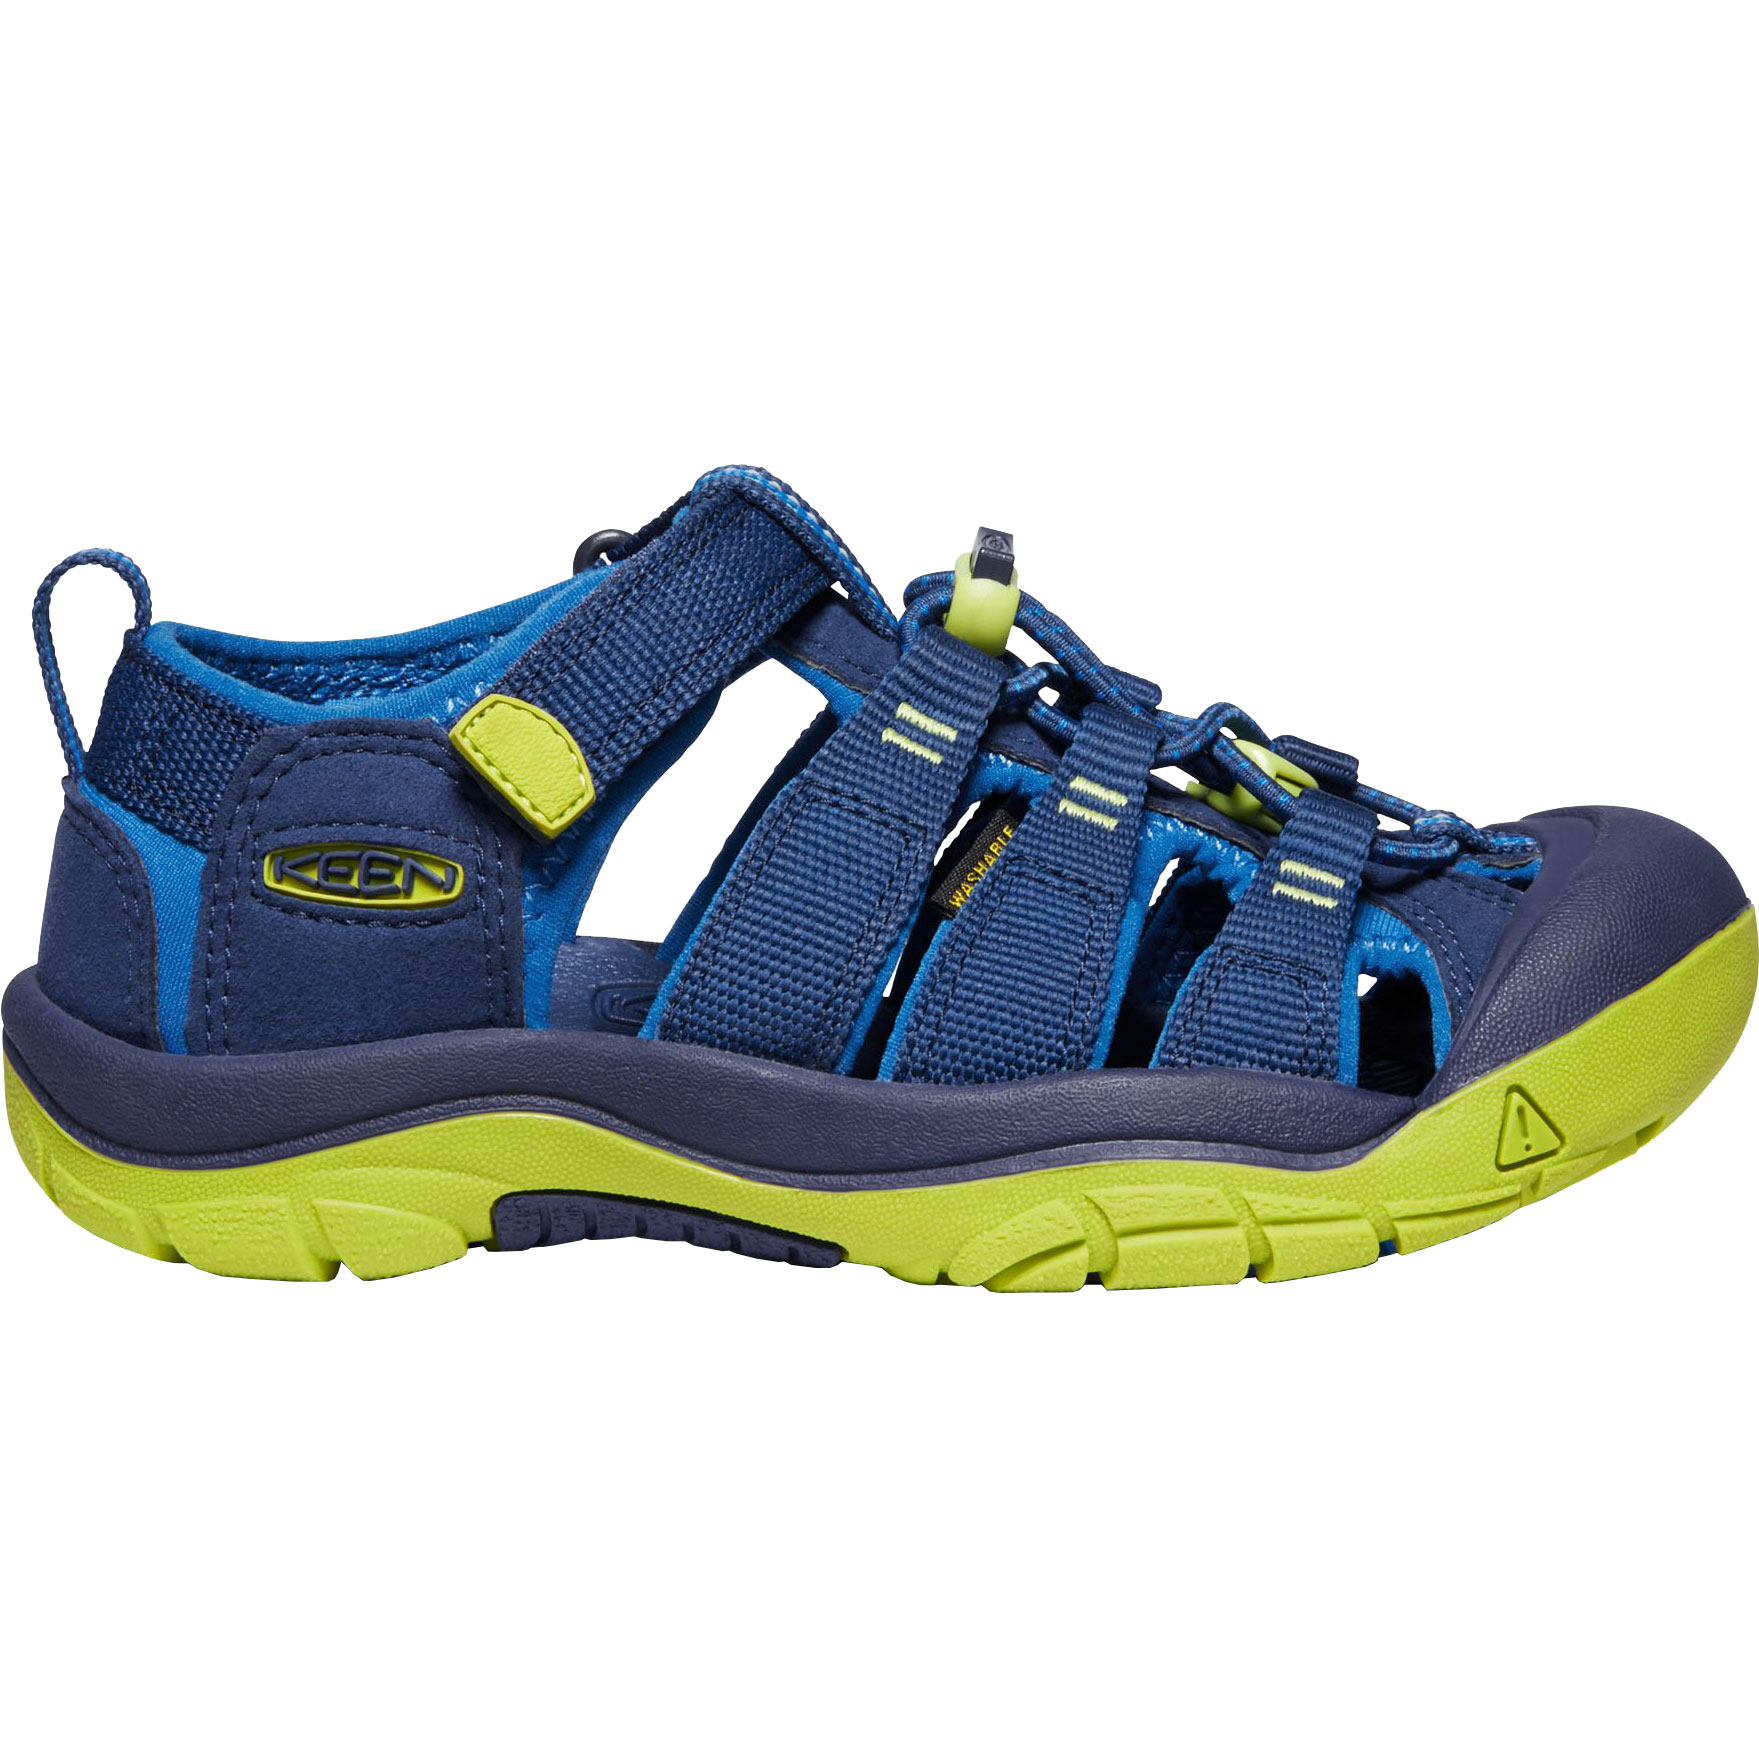 KEEN Newport H2 Jugend-Sandale - Blue Depths / Chartreuse